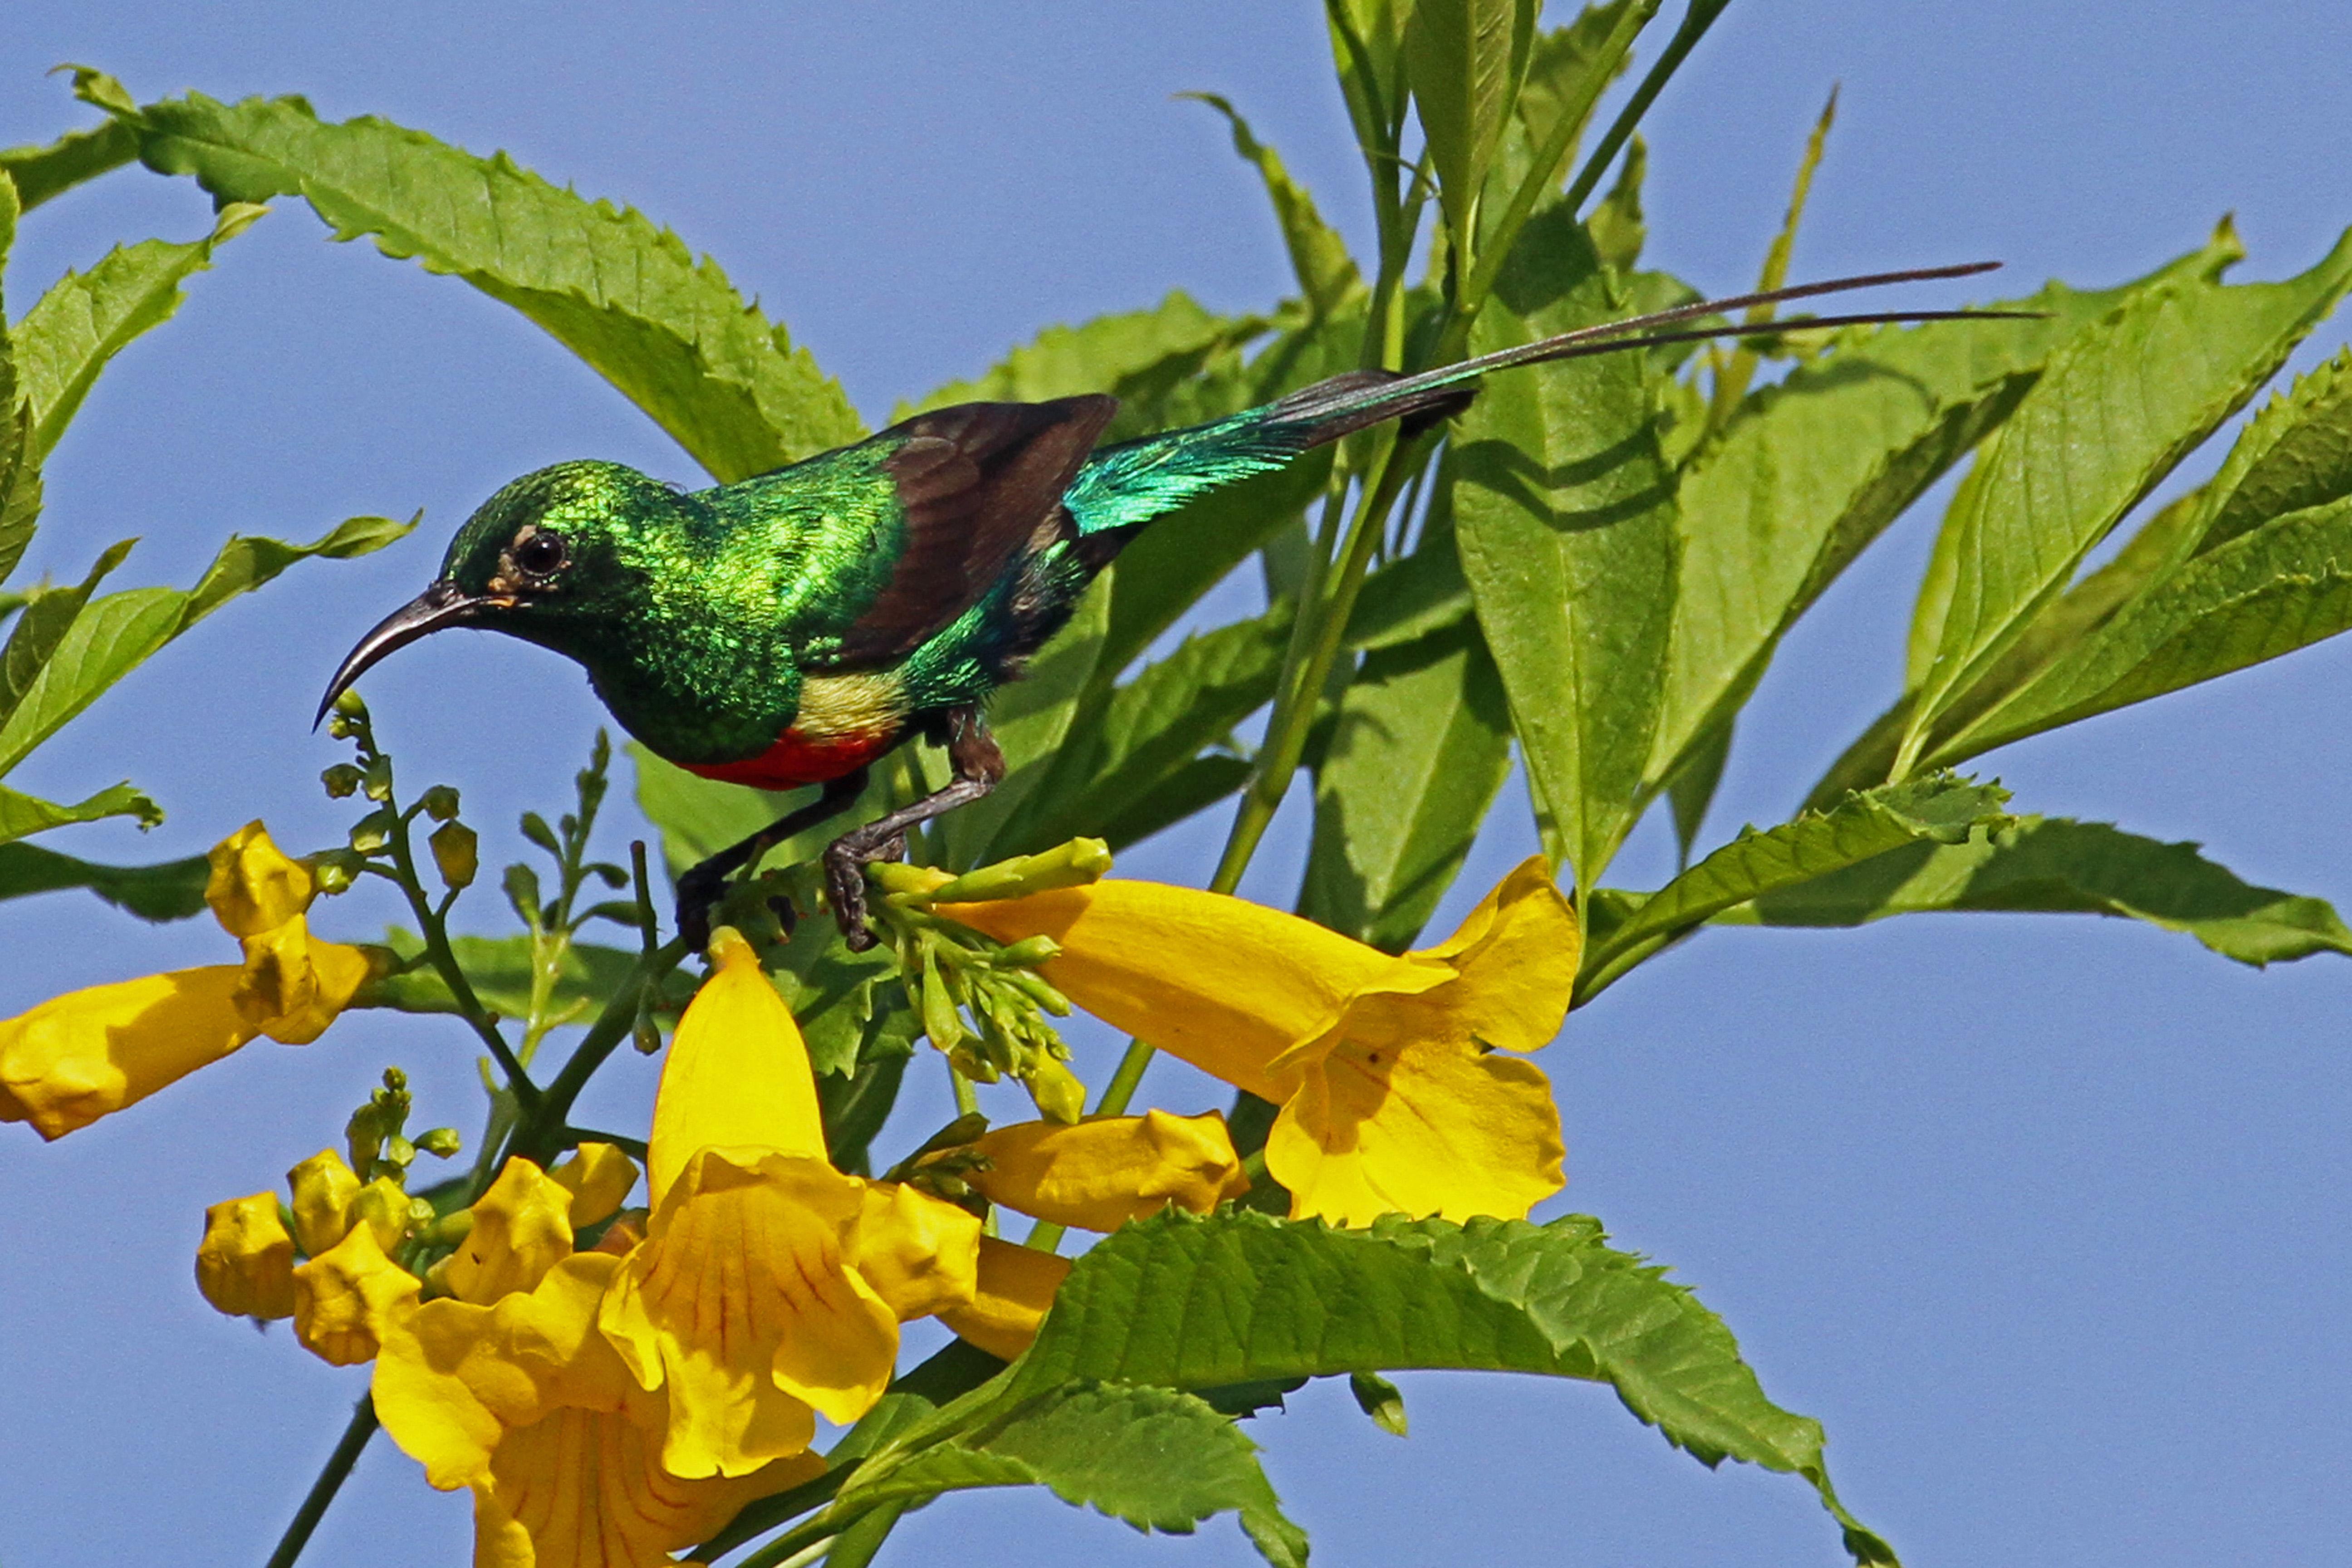 Watch How to Photograph a Bird video